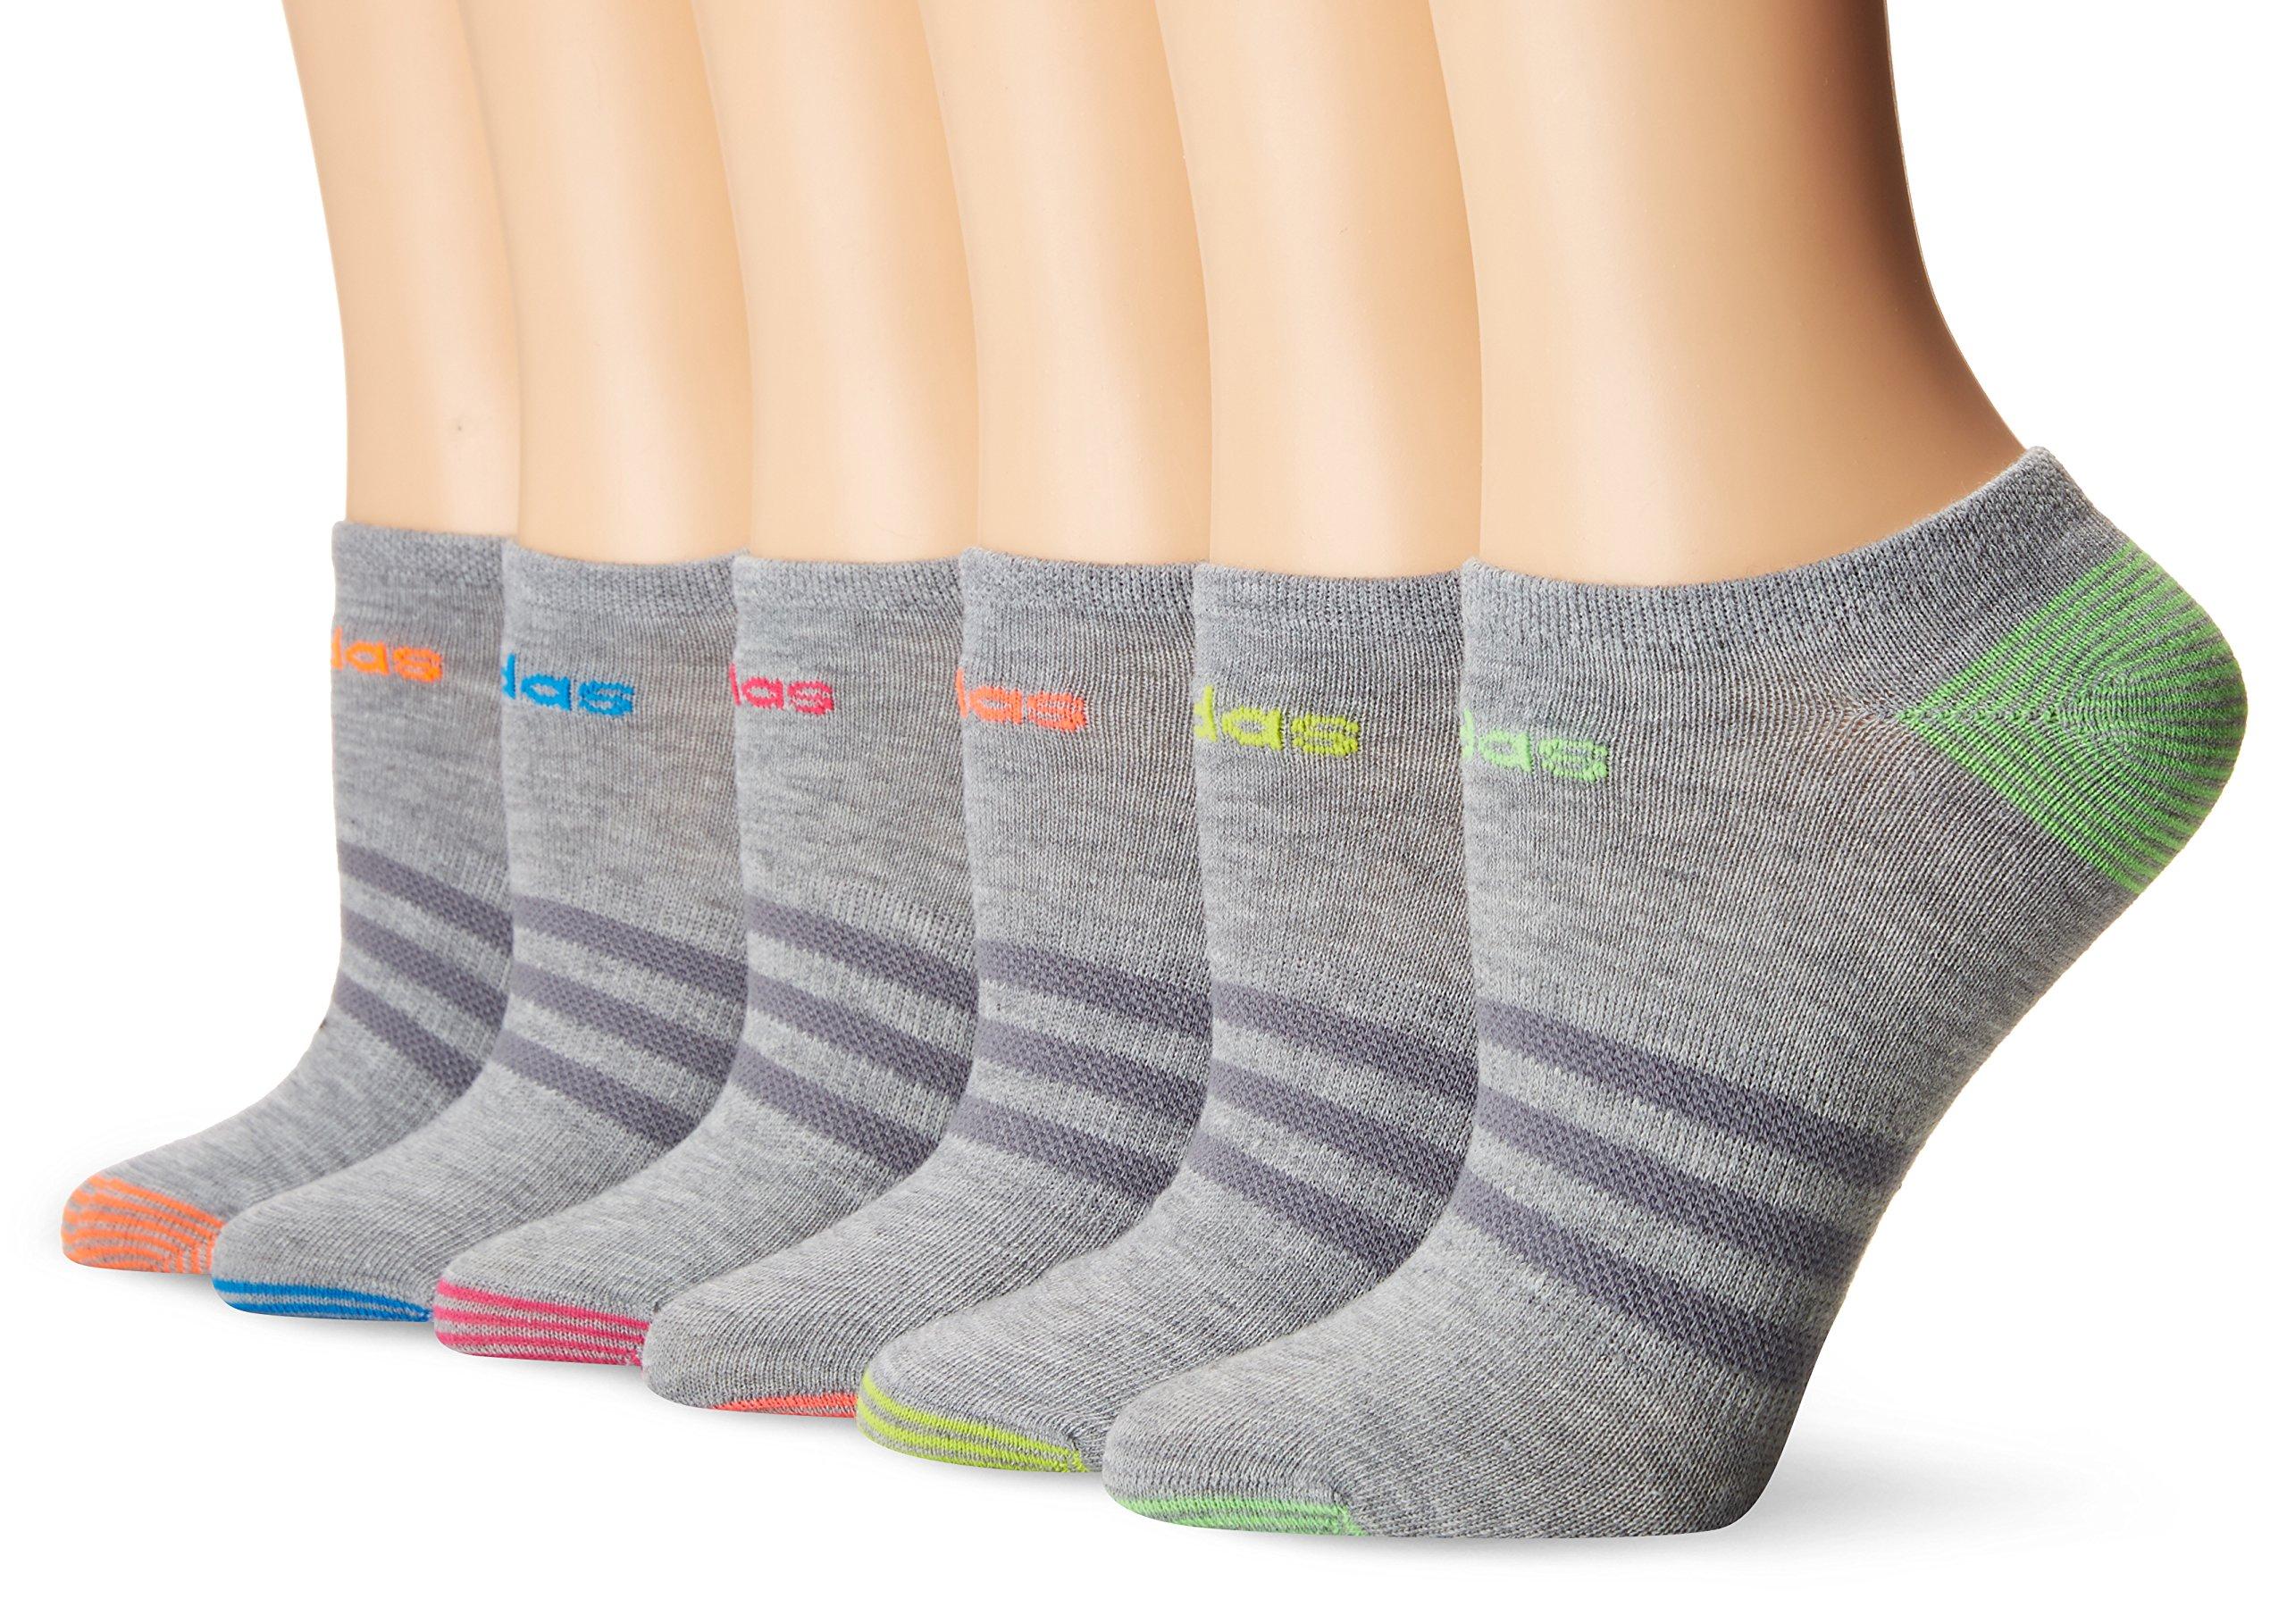 adidas Socks Women's Superlite Mini Stripe 6 Pack No Show Socks, Blue, Size 5-10